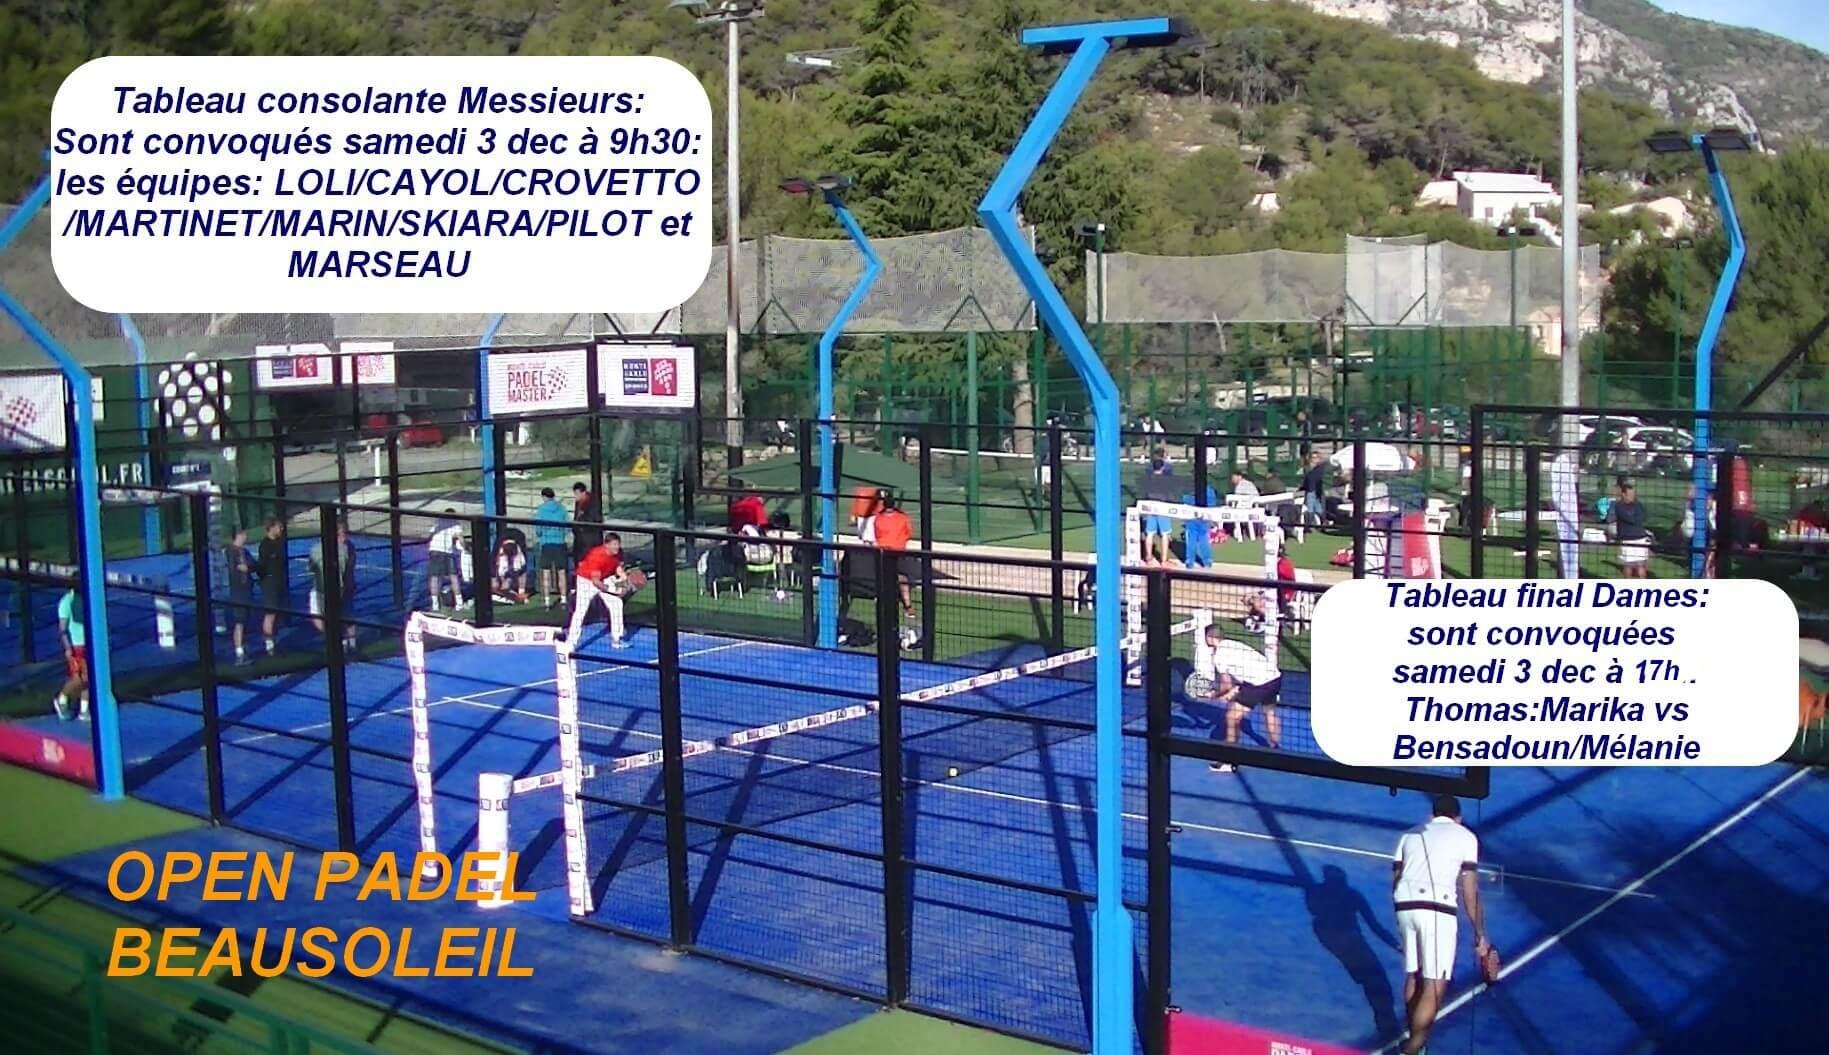 open-tennis-padel-soleil-beausoleil